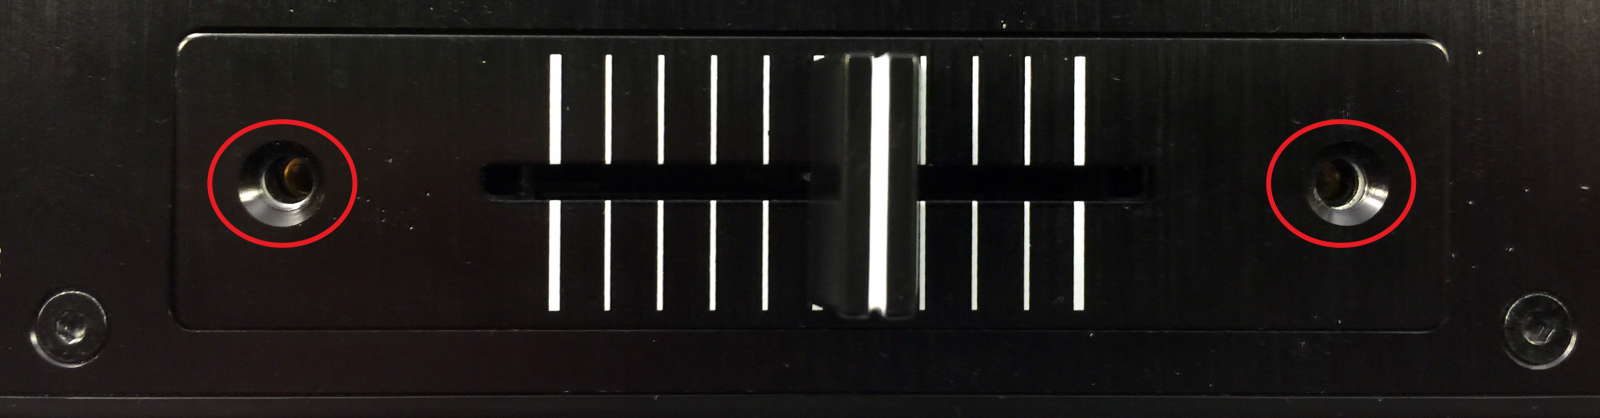 denondj mcx8000 screwsgonee